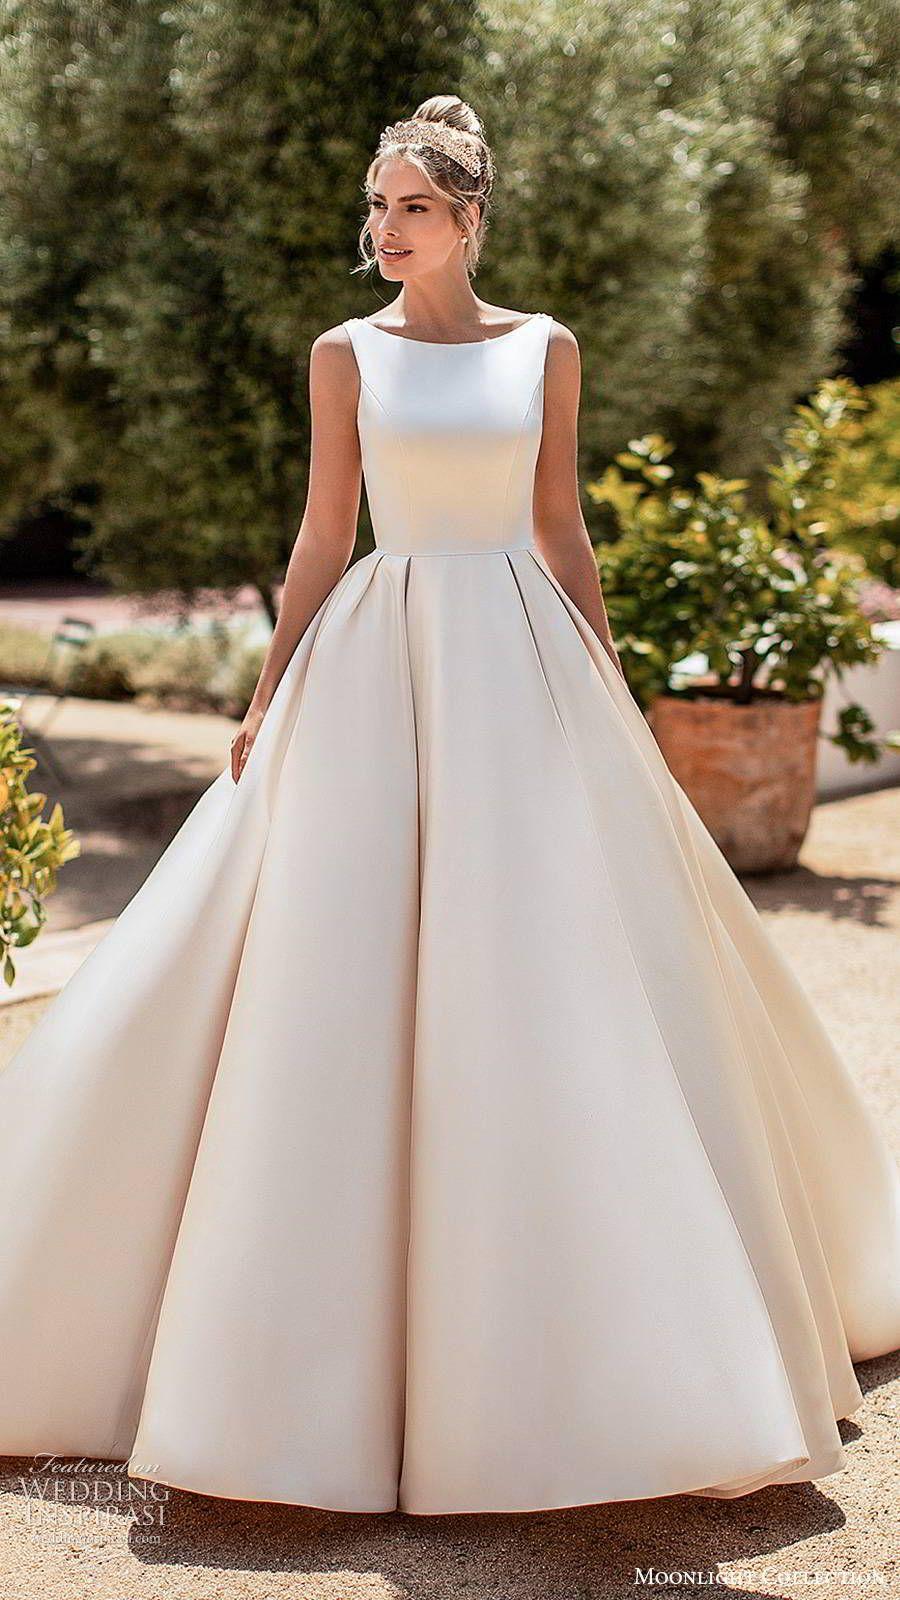 Moonlight Collection Spring 2020 Wedding Dresses Wedding Inspirasi Wedding Dresses Simple Elegant Wedding Dress Elegant Wedding Gowns [ 1600 x 900 Pixel ]